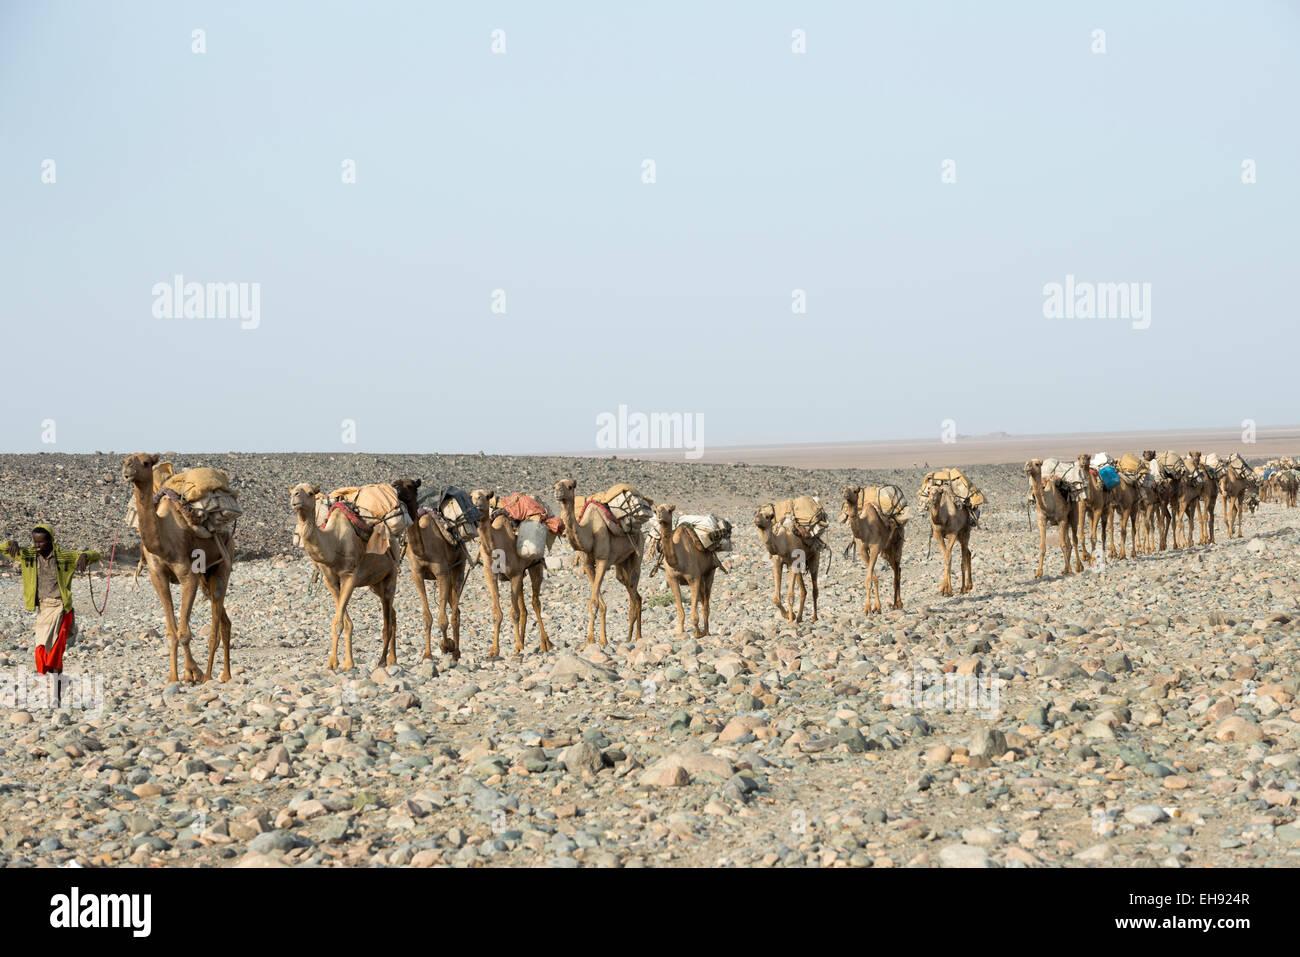 Salt caravan in the Danakil Depression. - Stock Image